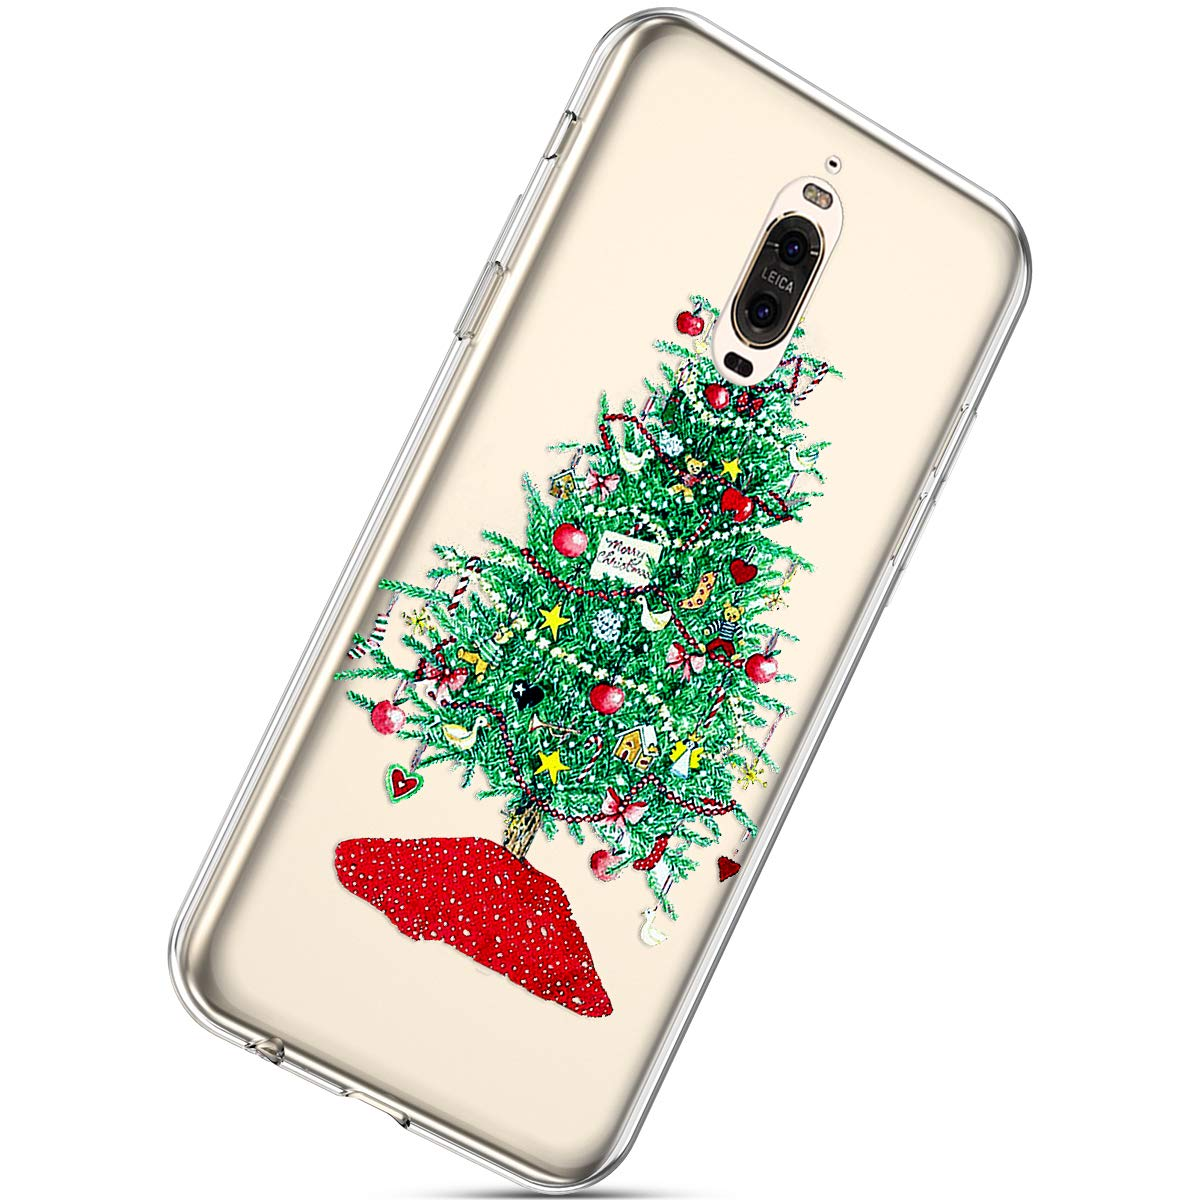 Herbests Coque Silicone pour Huawei Mate 9 Pro Housse avec Noë l Motif Ultra Mince Clear Transparent Anti Choc Bumper Coque Case pour Huawei Mate 9 Pro, Noë l #9 Noël #9 HER0028057